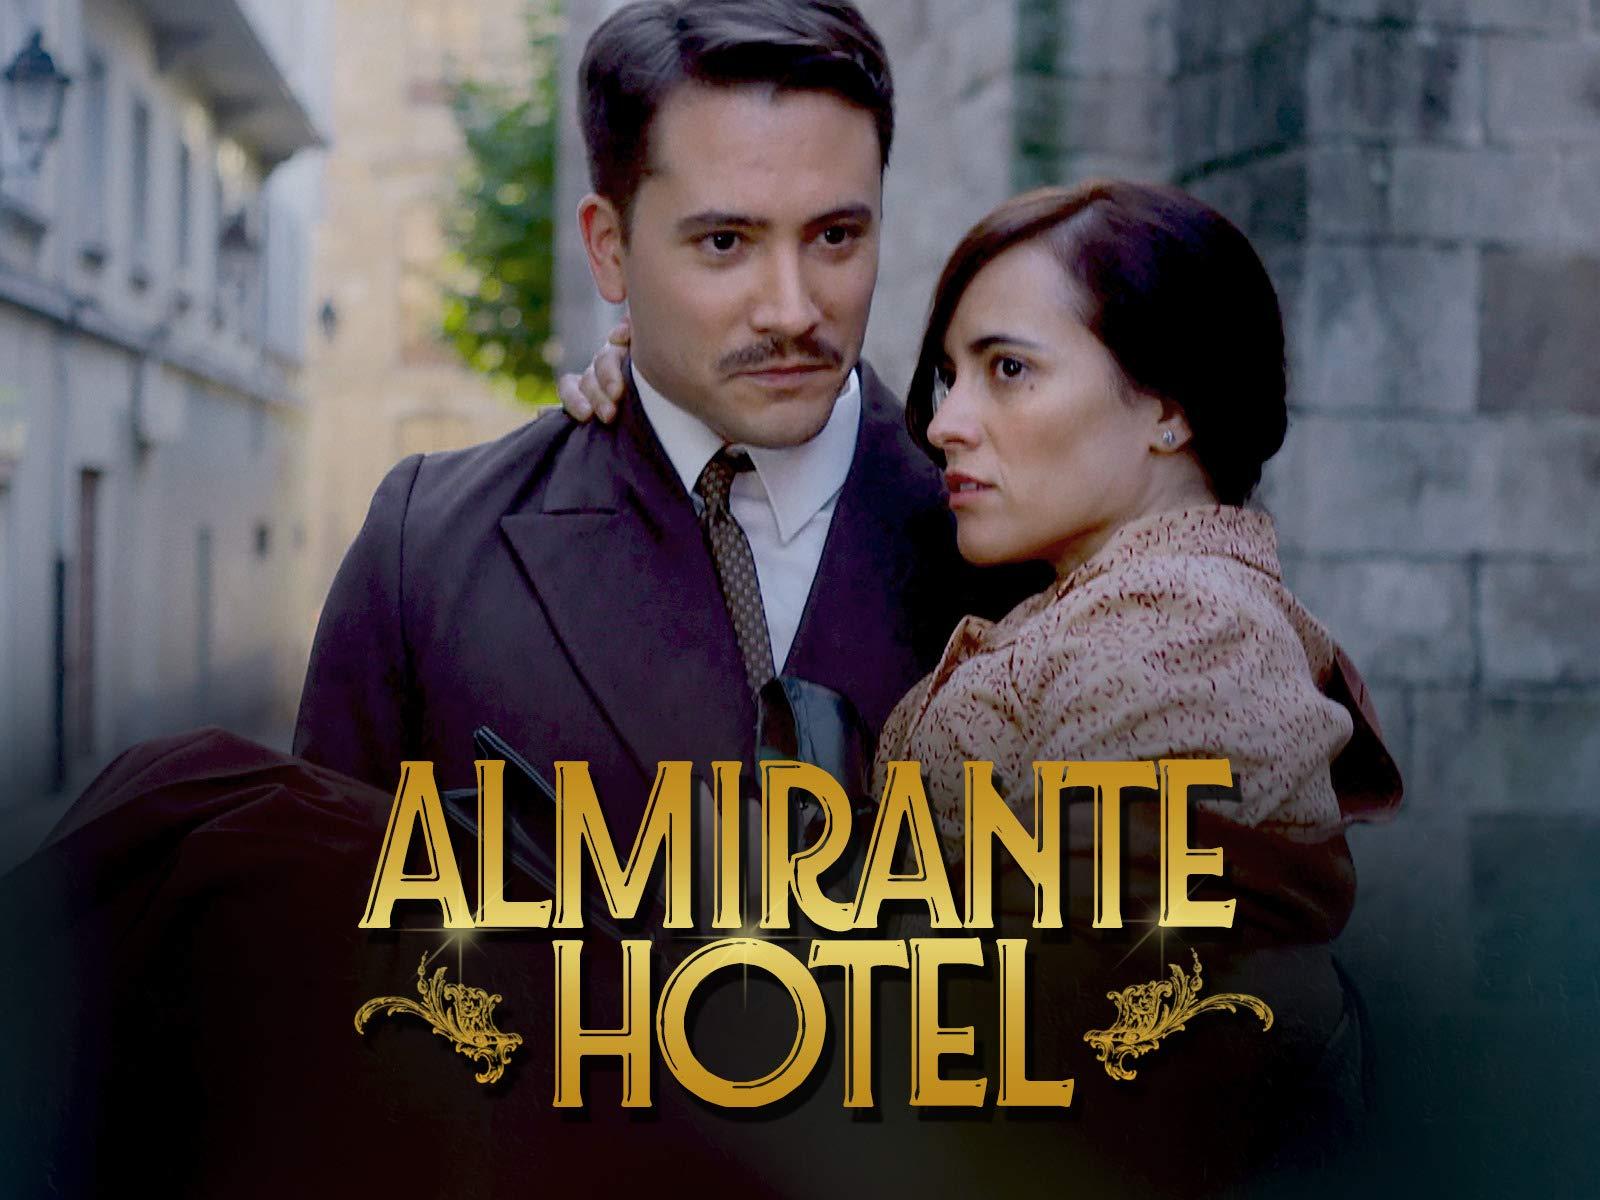 Almirante Hotel - Season 1